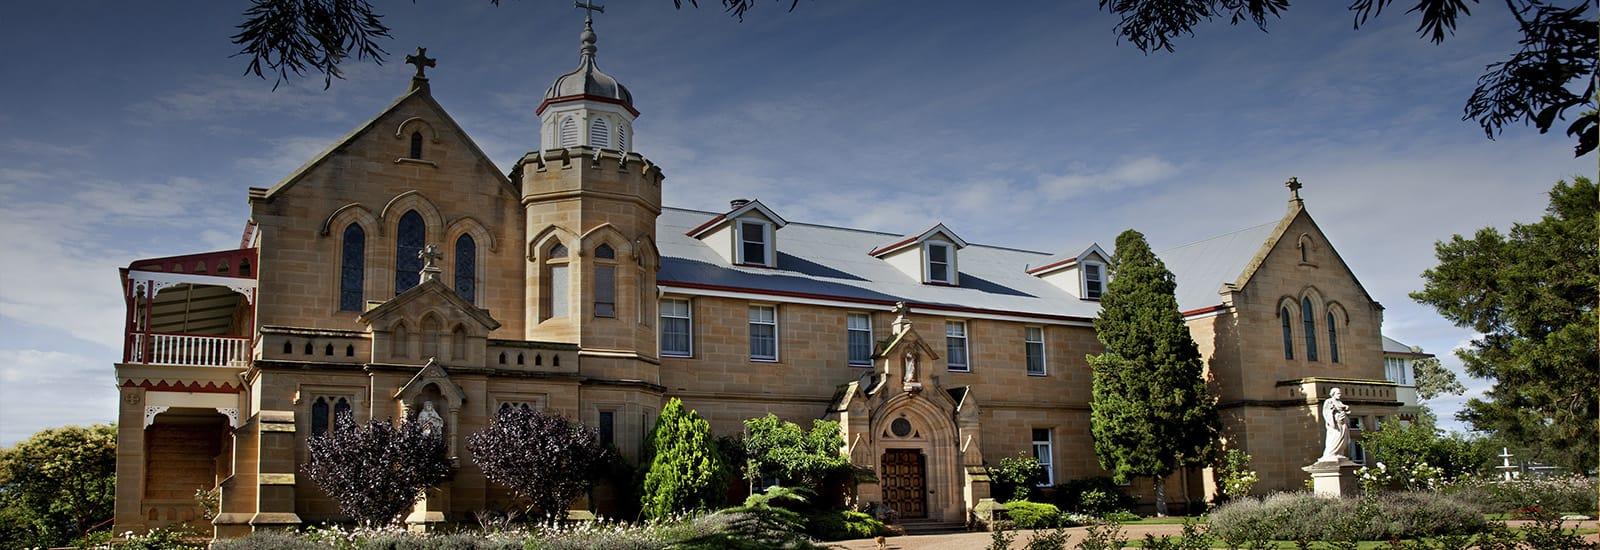 warwick manor